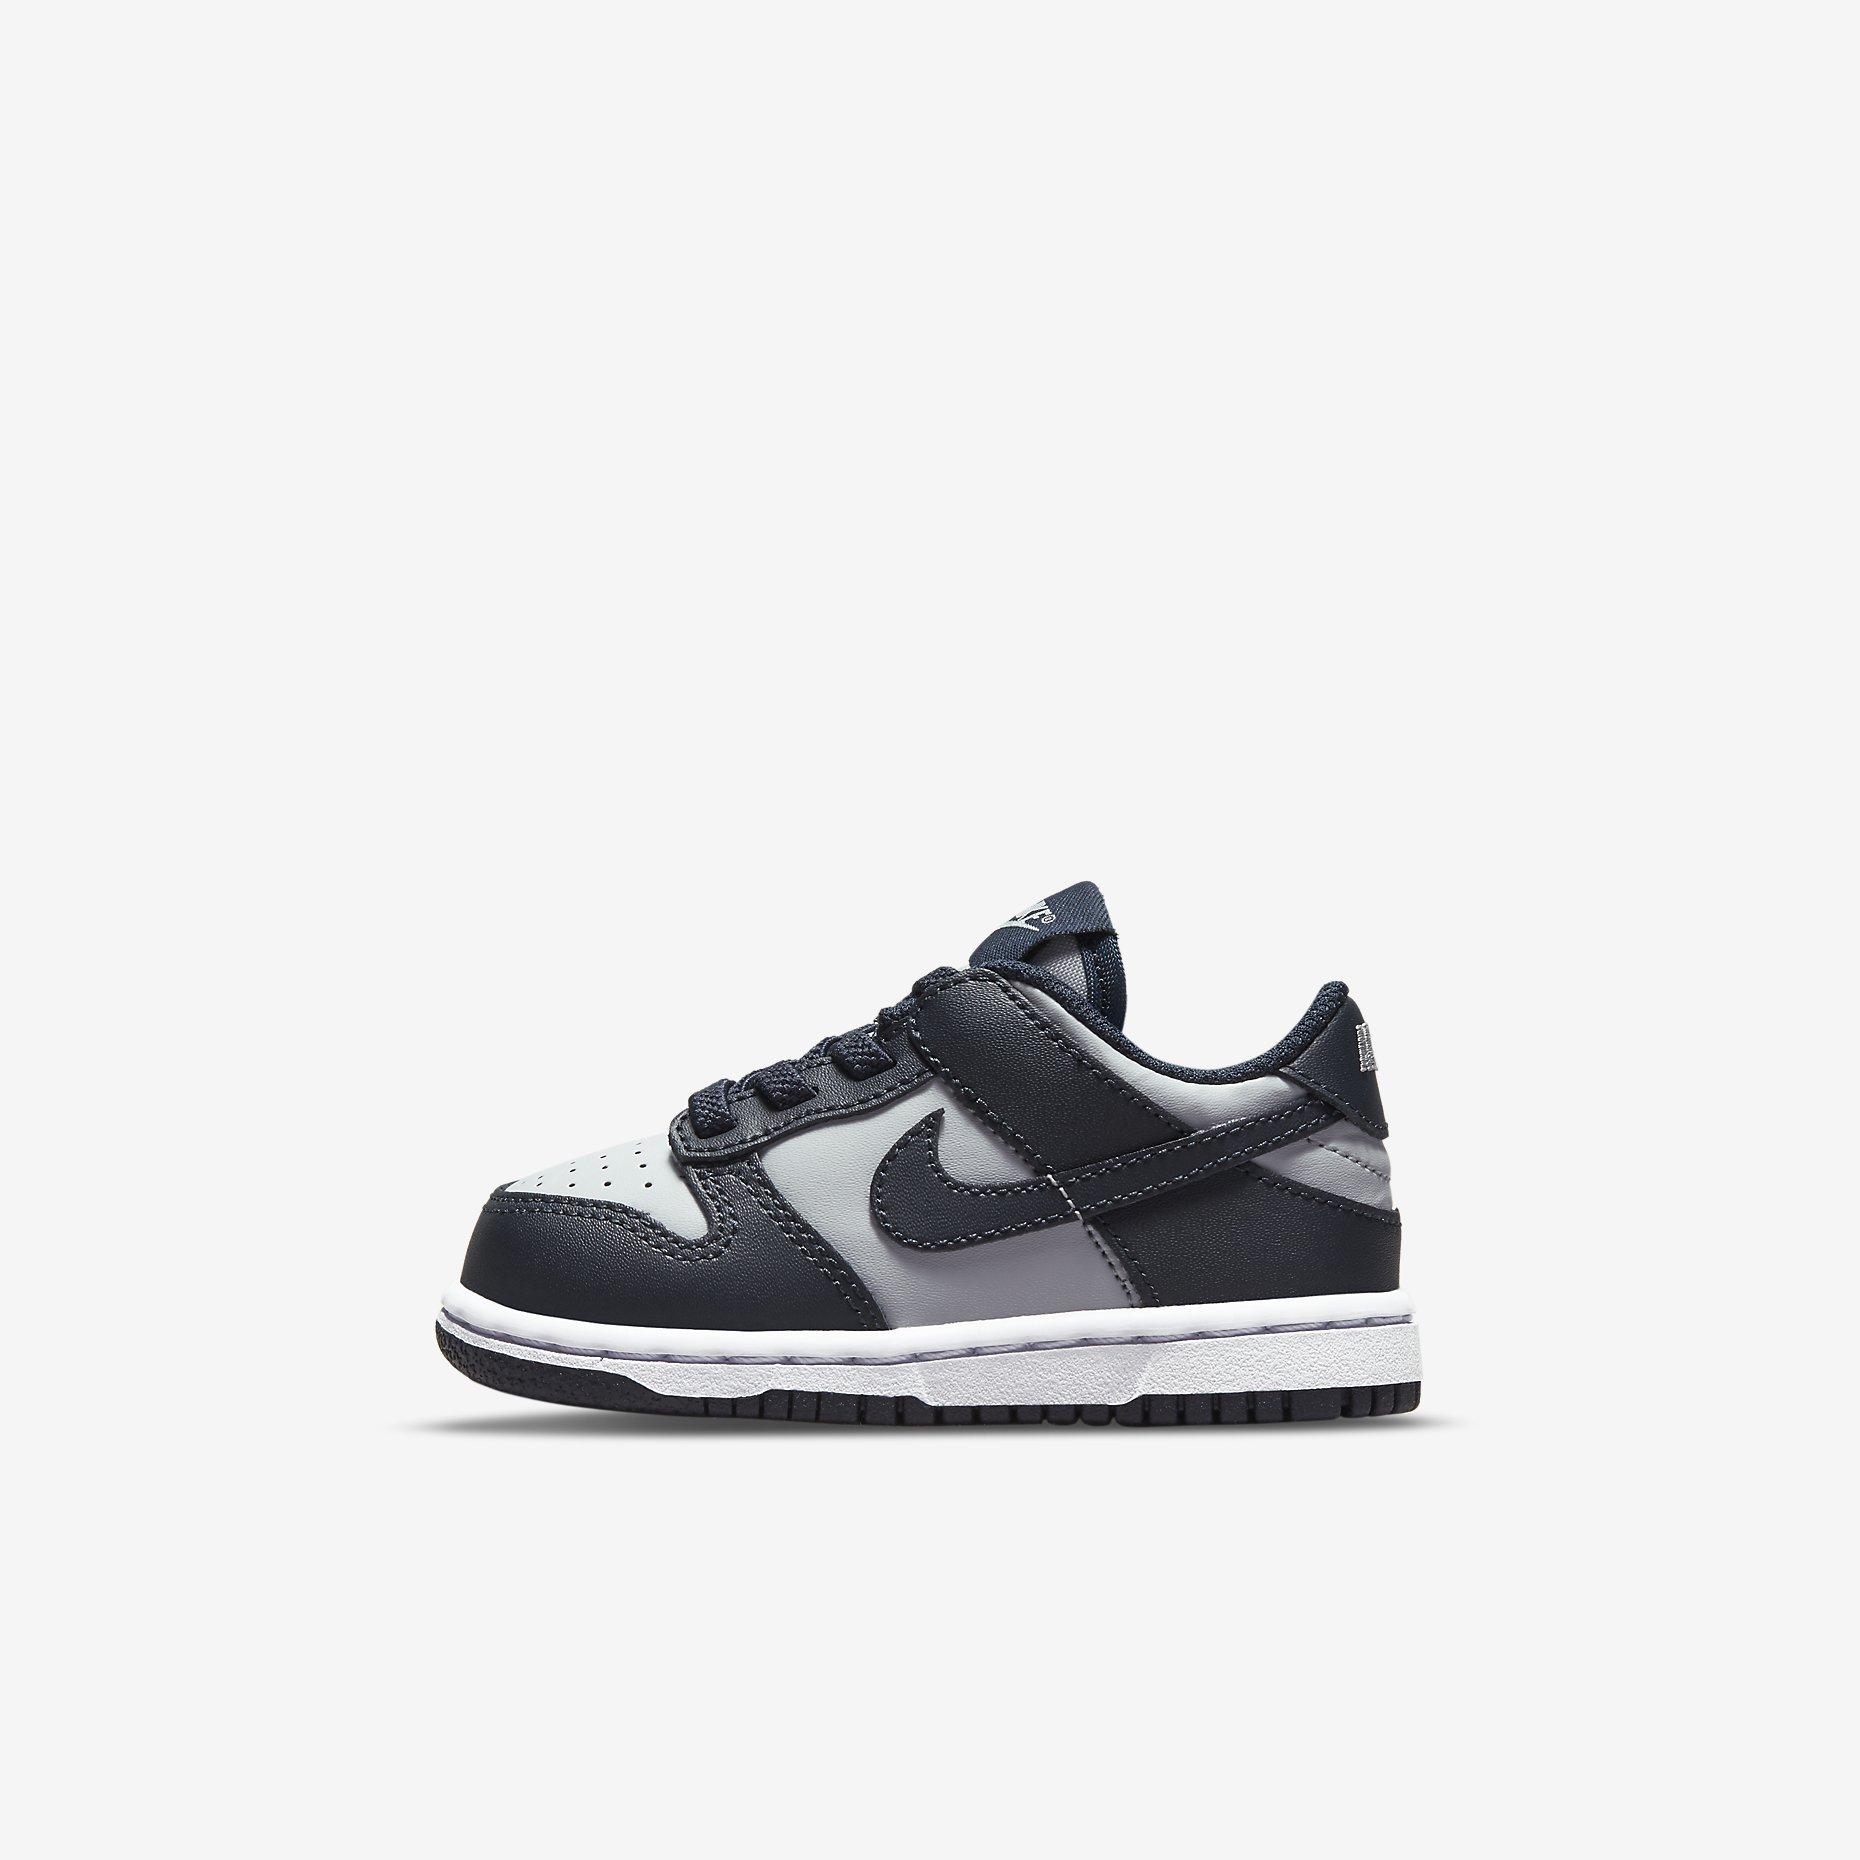 Nike Dunk Low TD 'Georgetown'